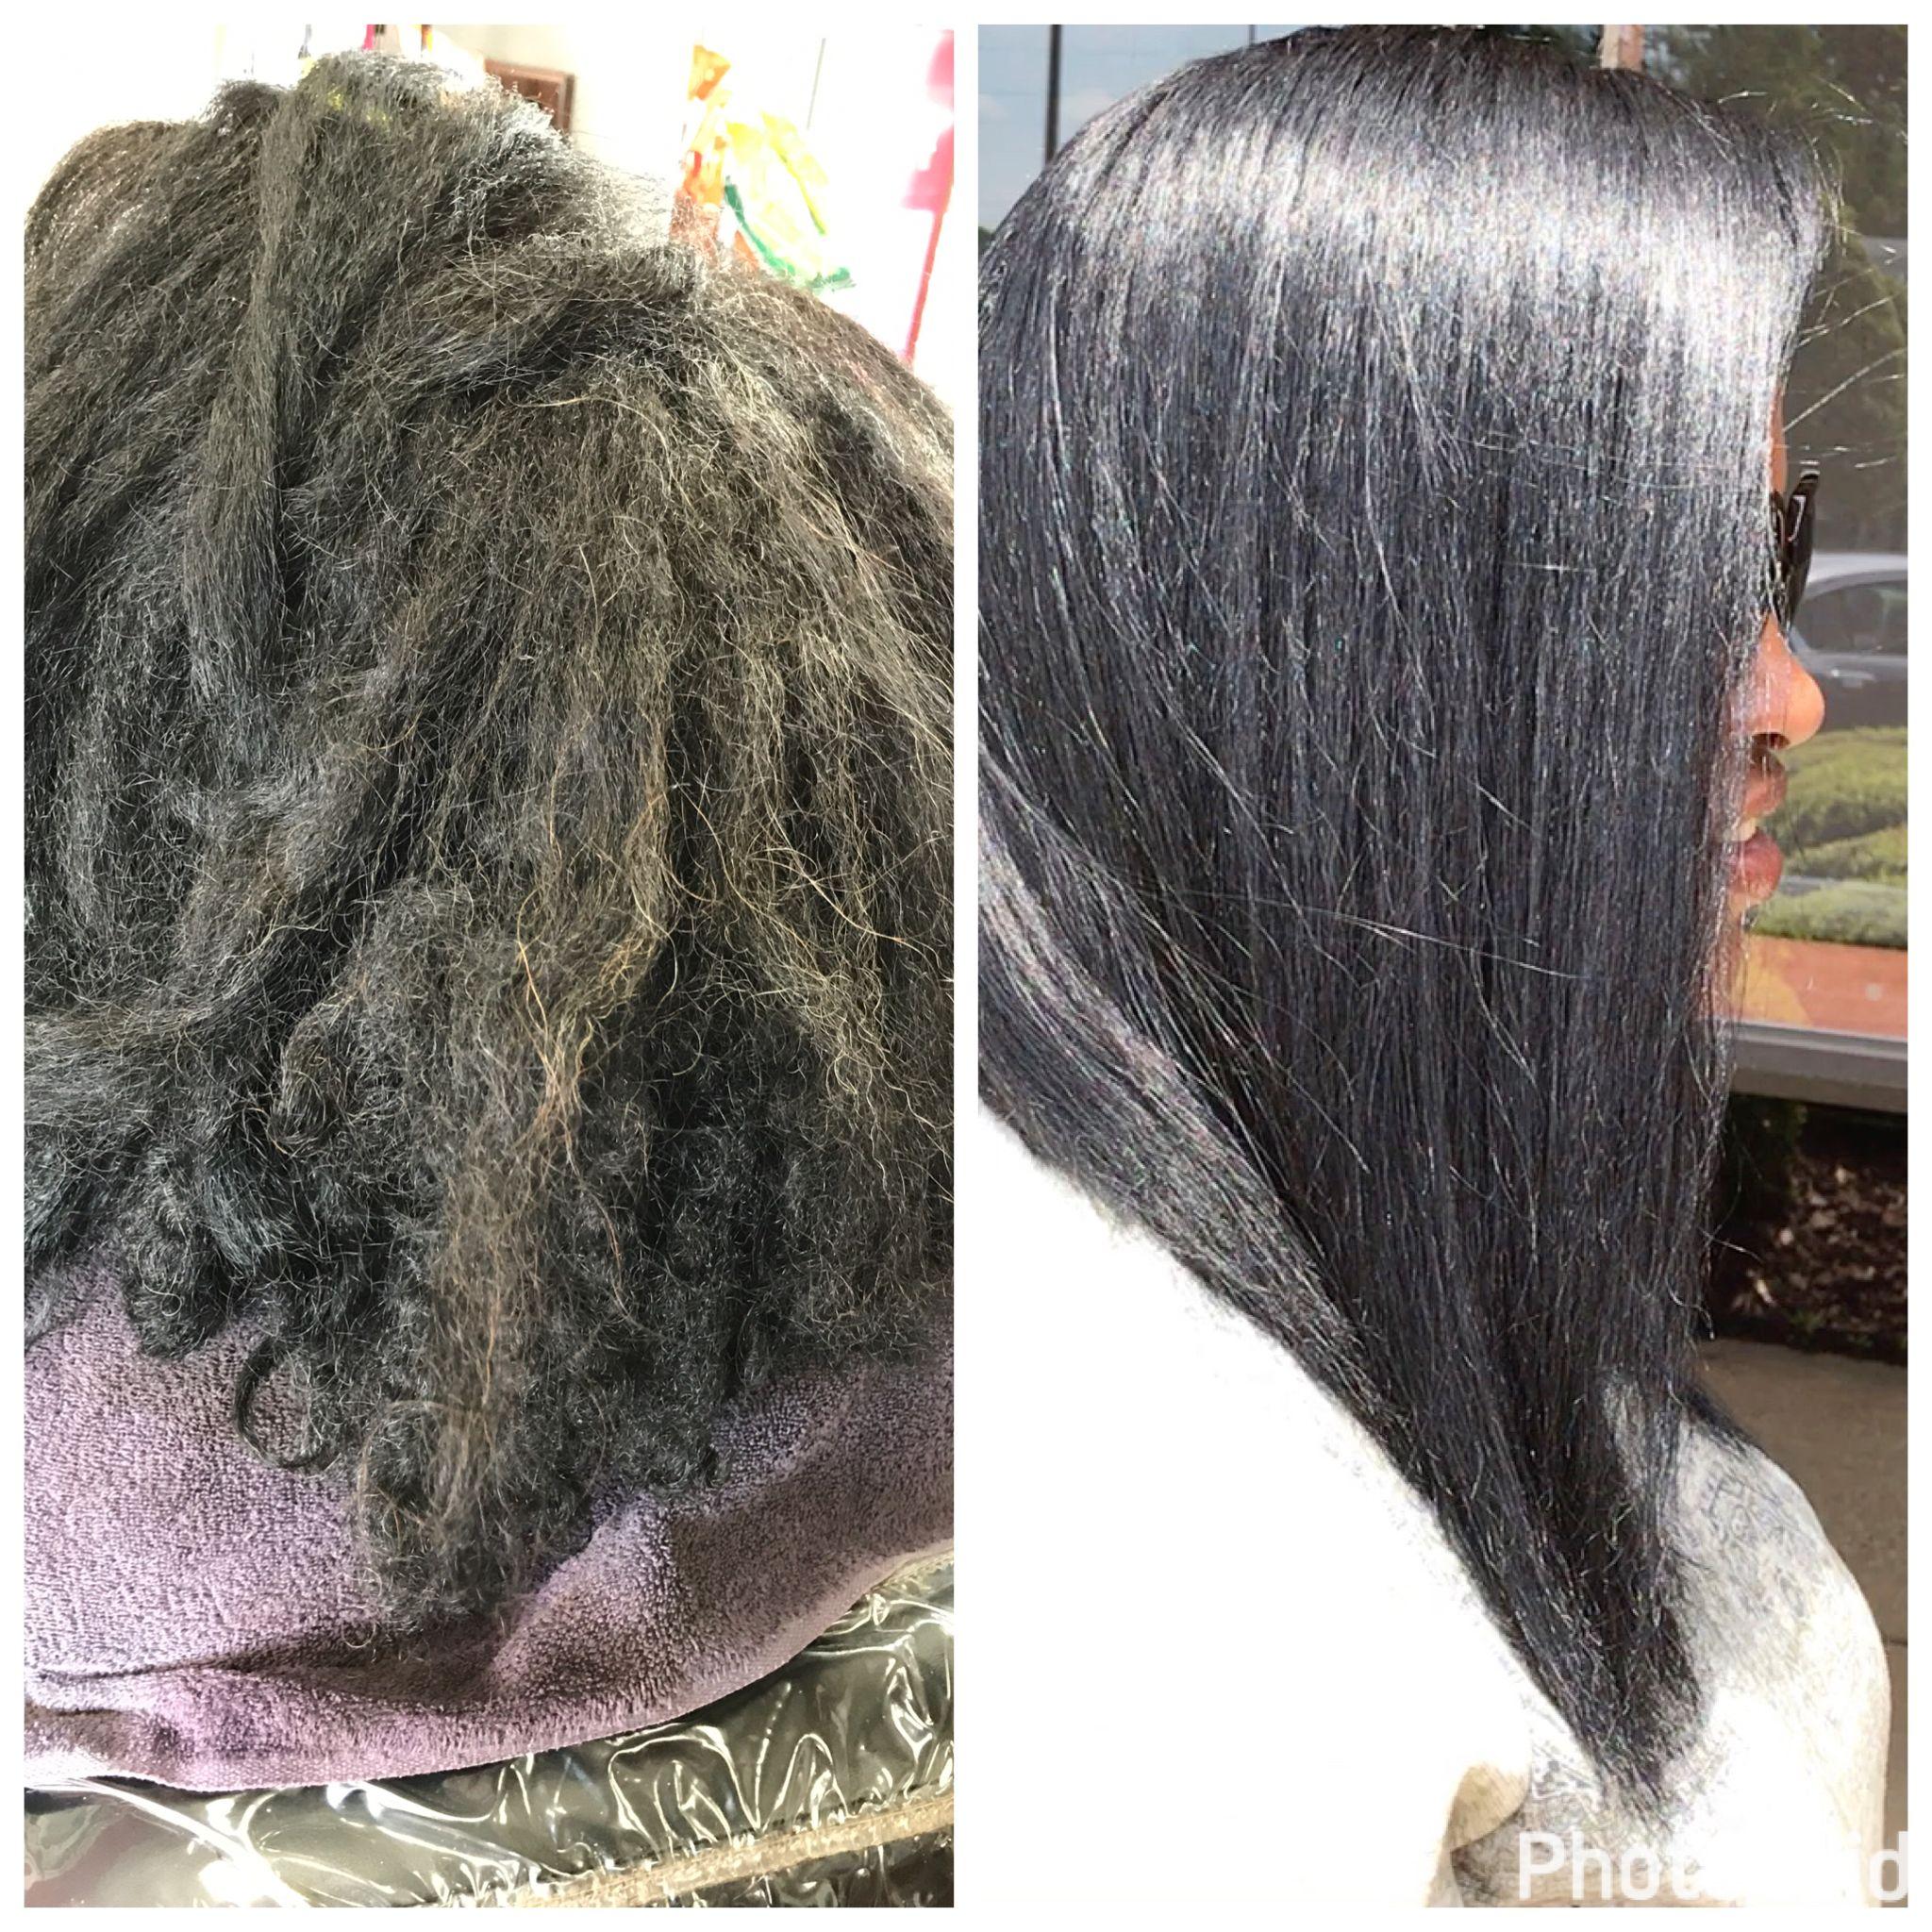 Silk Press On Natural Hair By Hairstylist Latoya Jones At L Jones Salon Www Latoyajoneshair Flat Iron Hair Styles Silk Press Natural Hair Natural Hair Styles